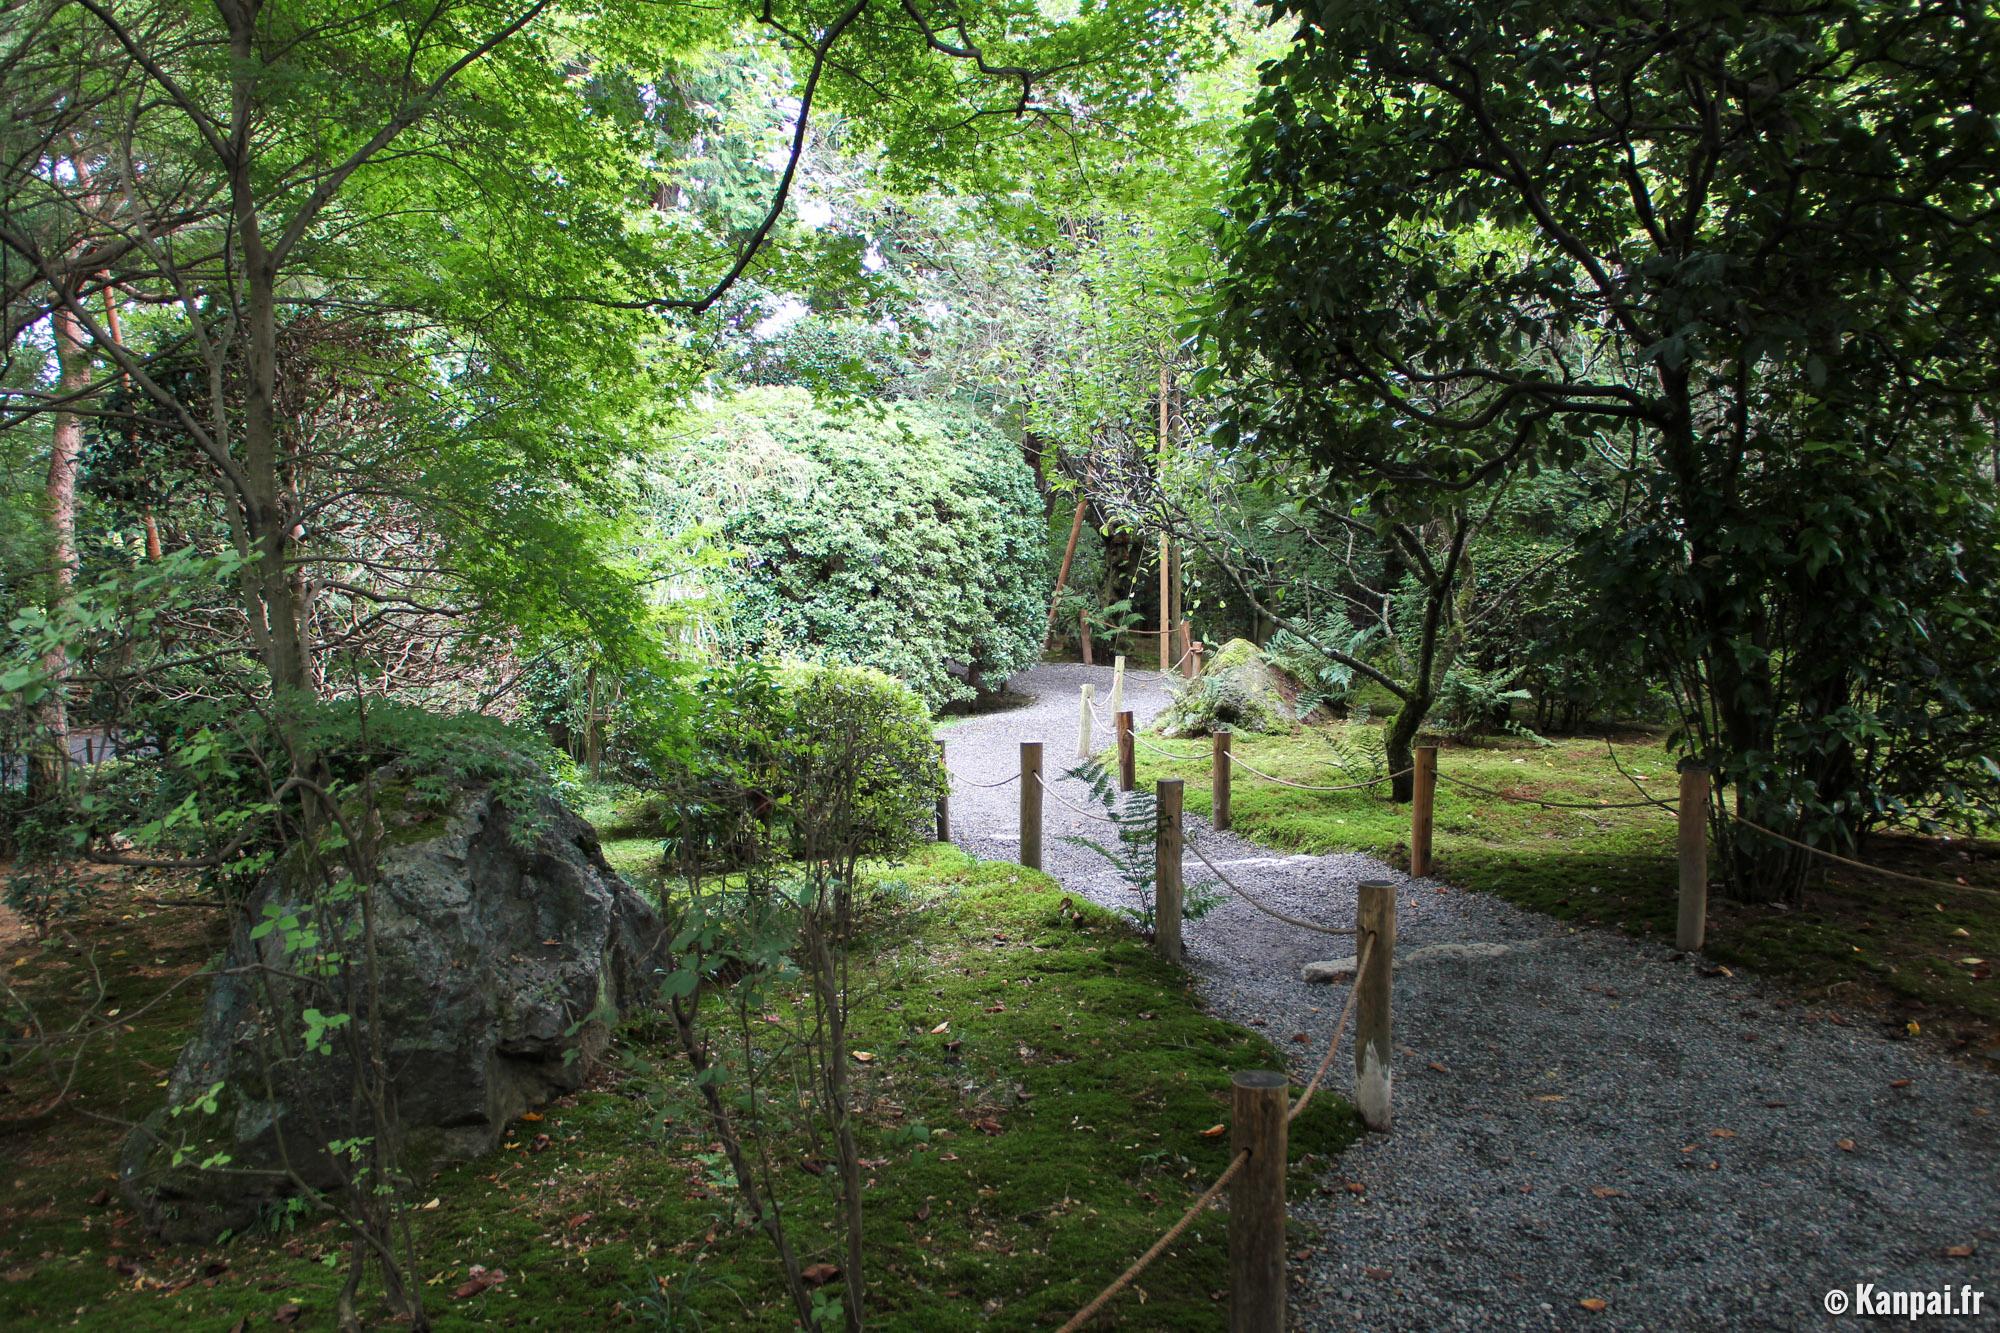 Ryoan Ji Le Contemplatif Jardin De Pierres